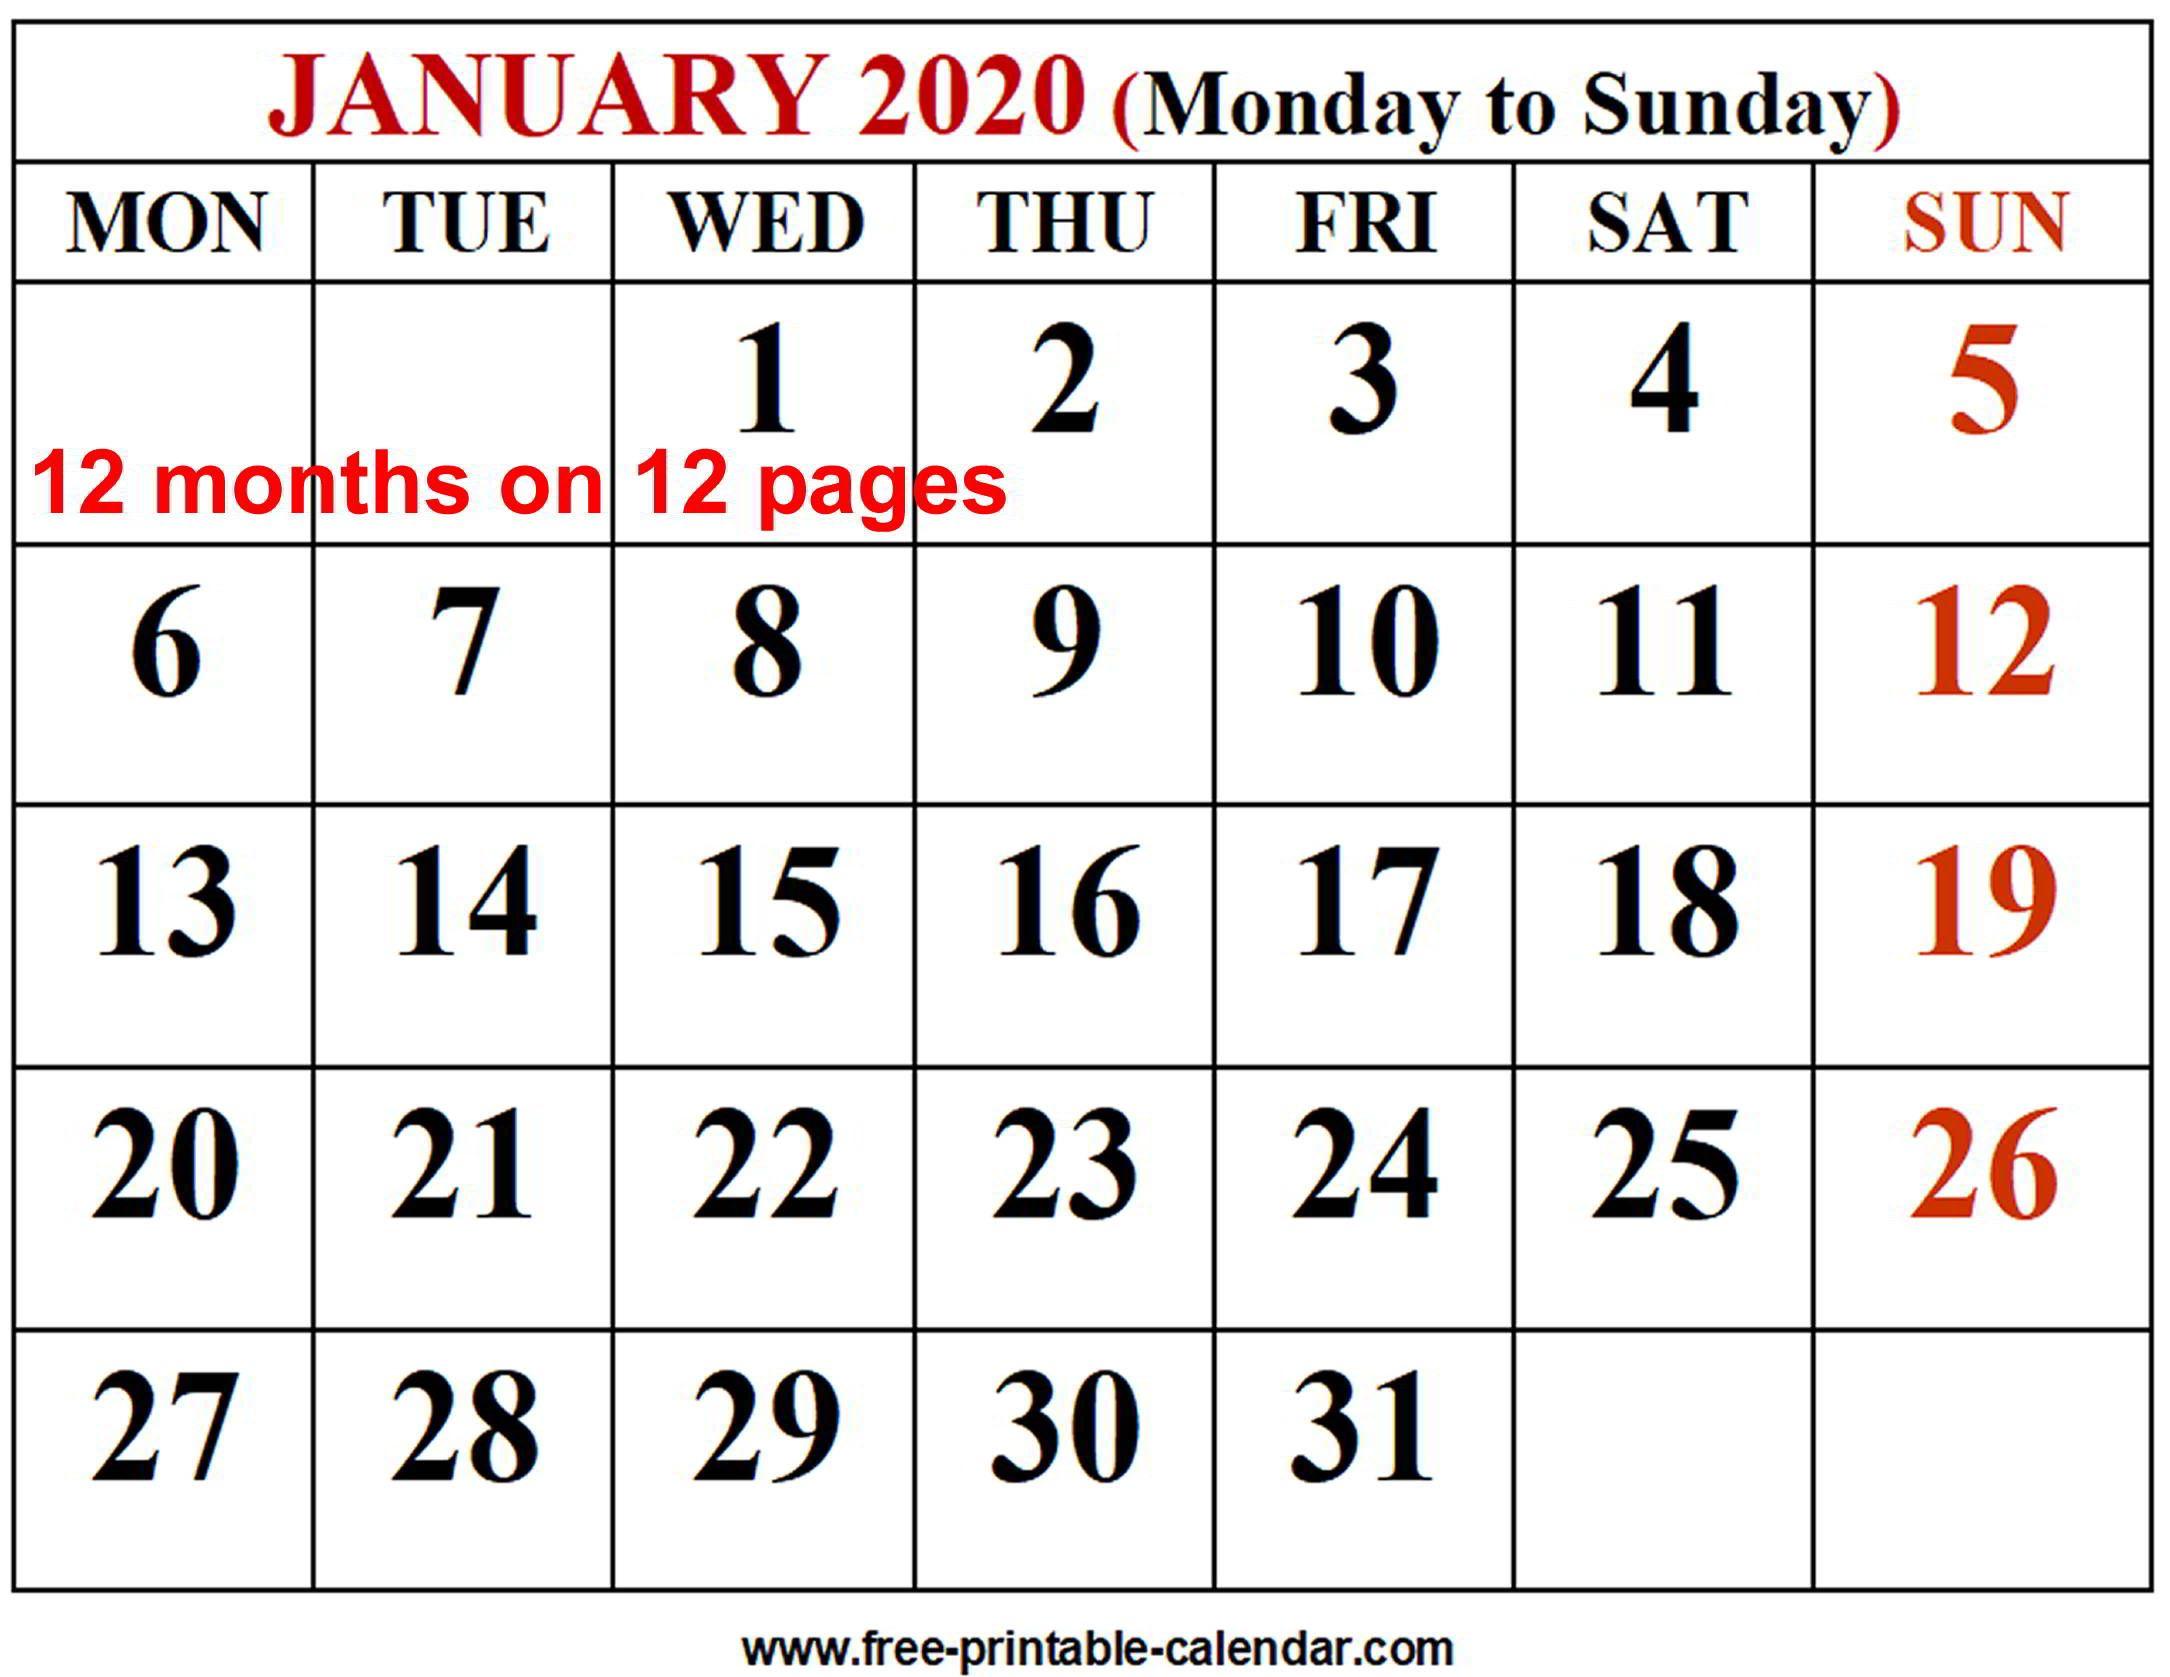 2020 Calendar Template - Free-Printable-Calendar | Bible